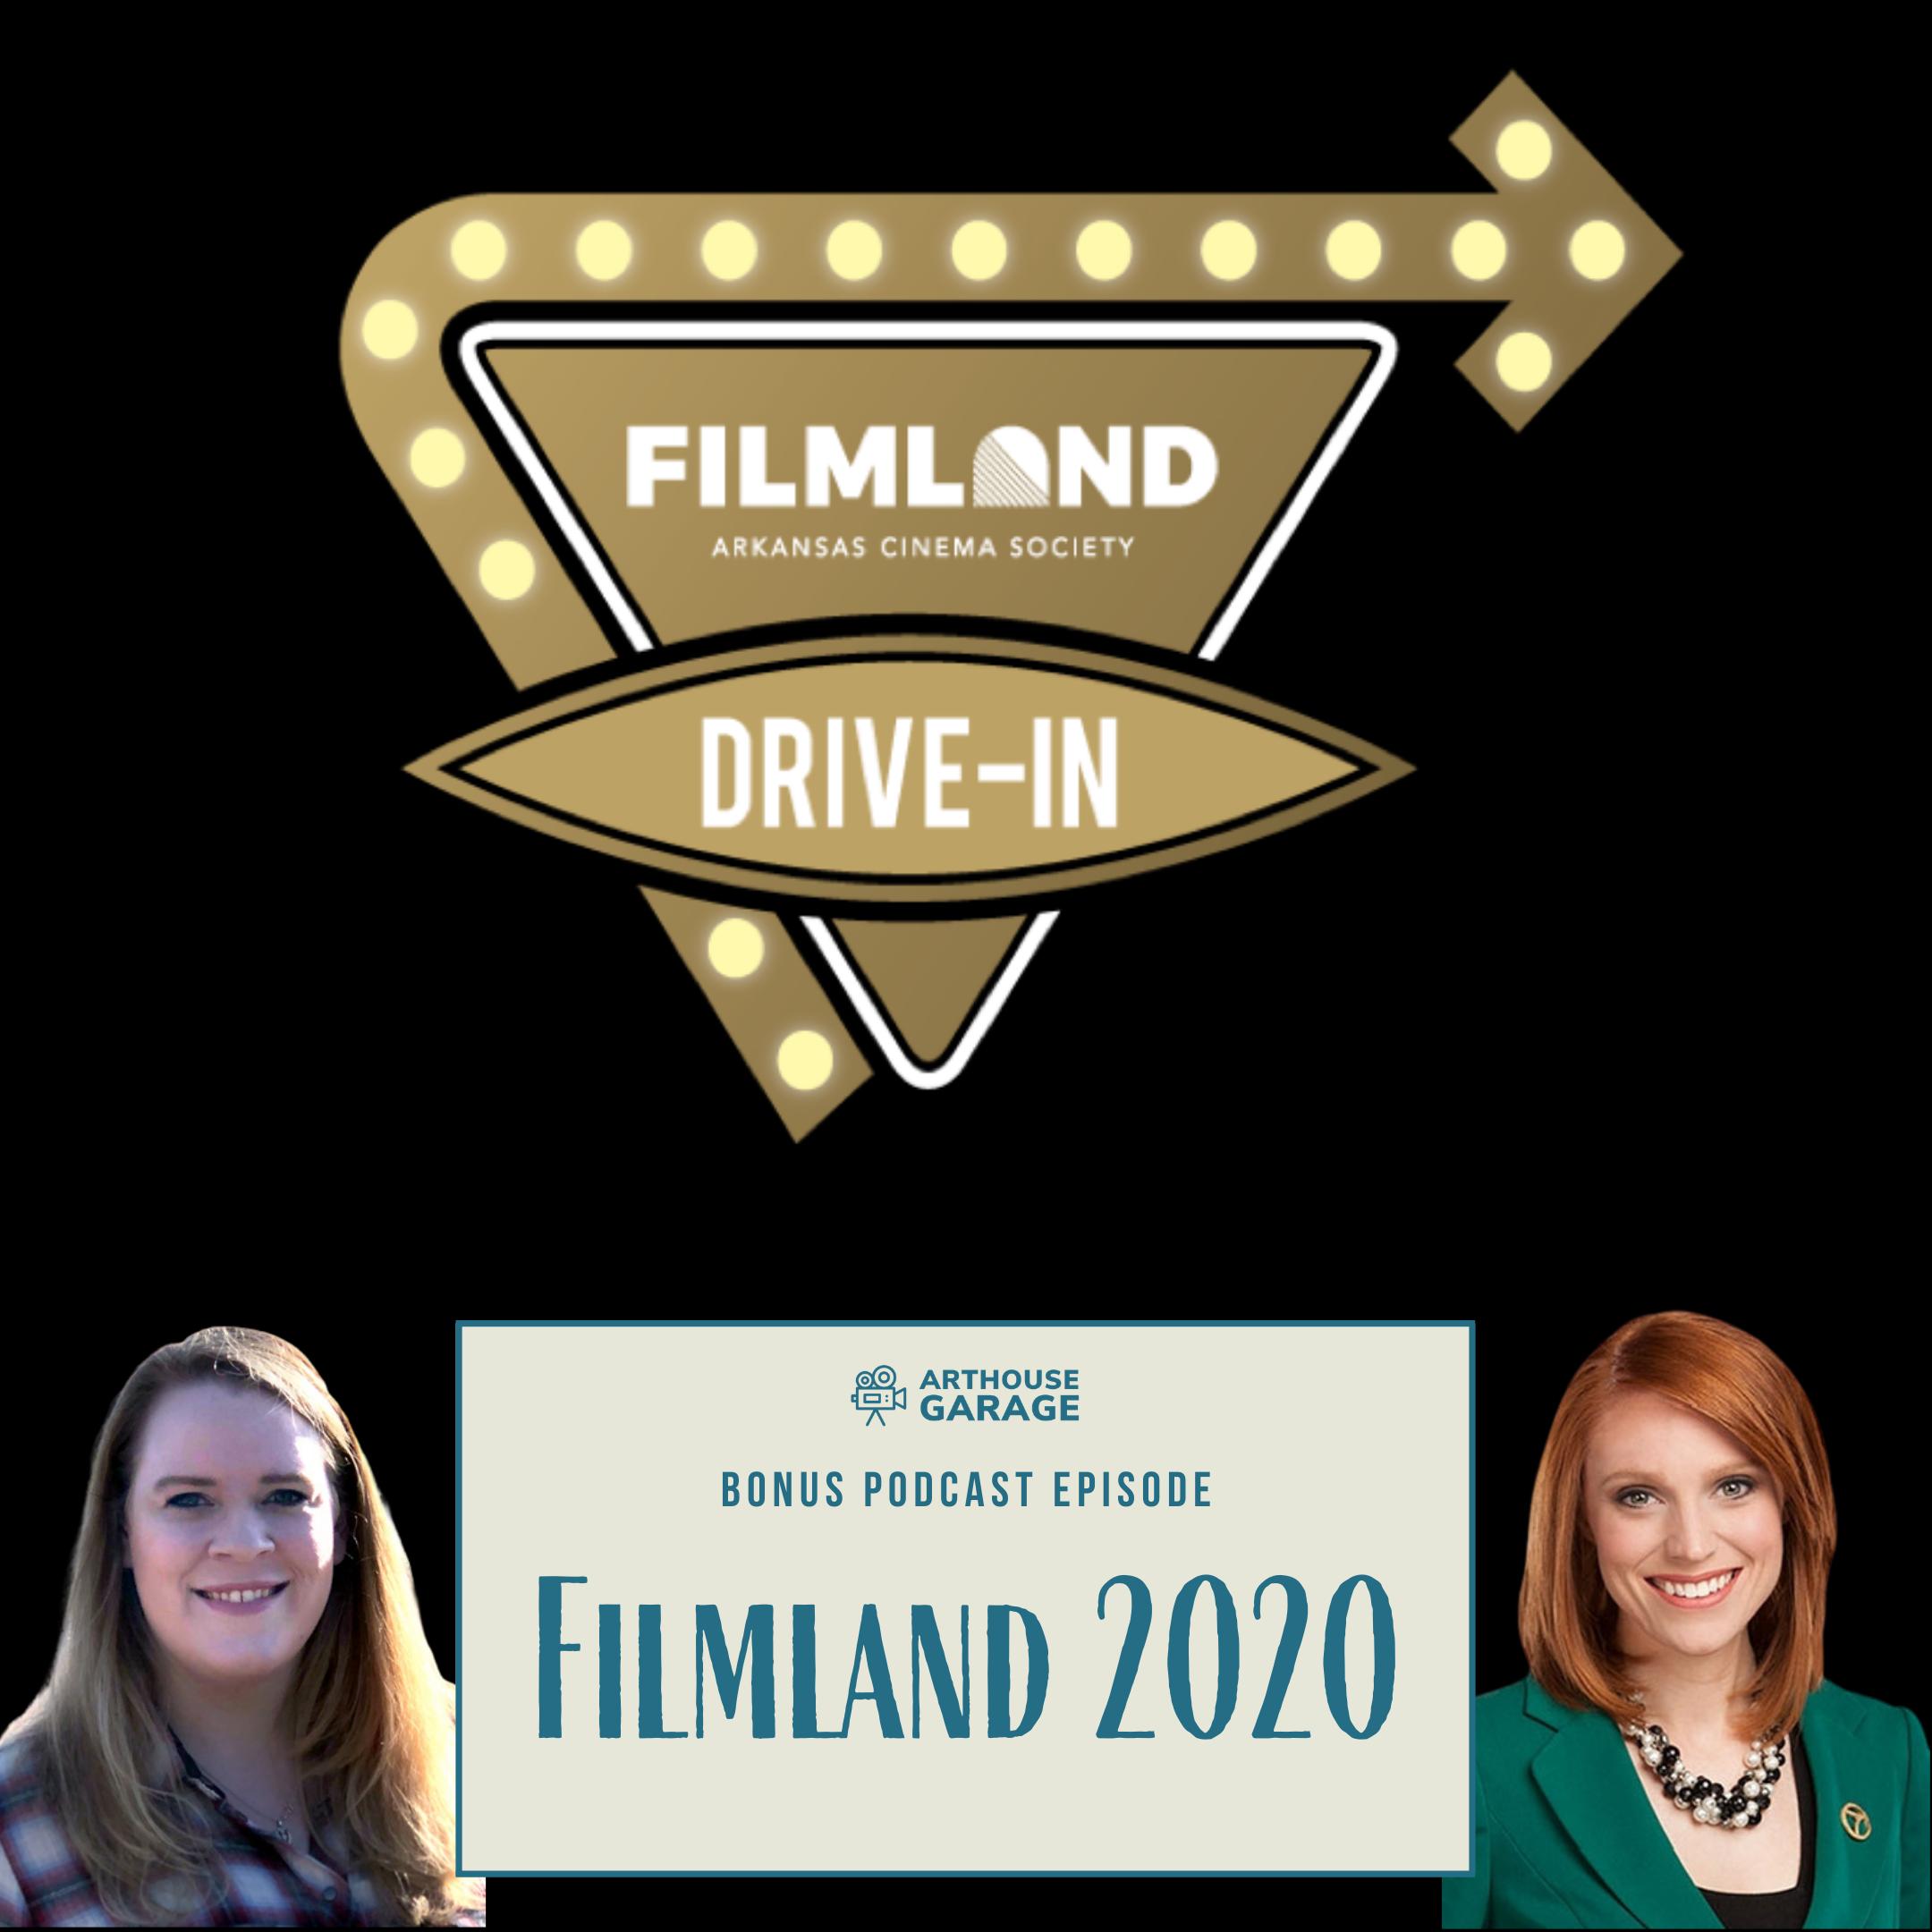 Bonus episode: FILMLAND 2020 Festival Preview